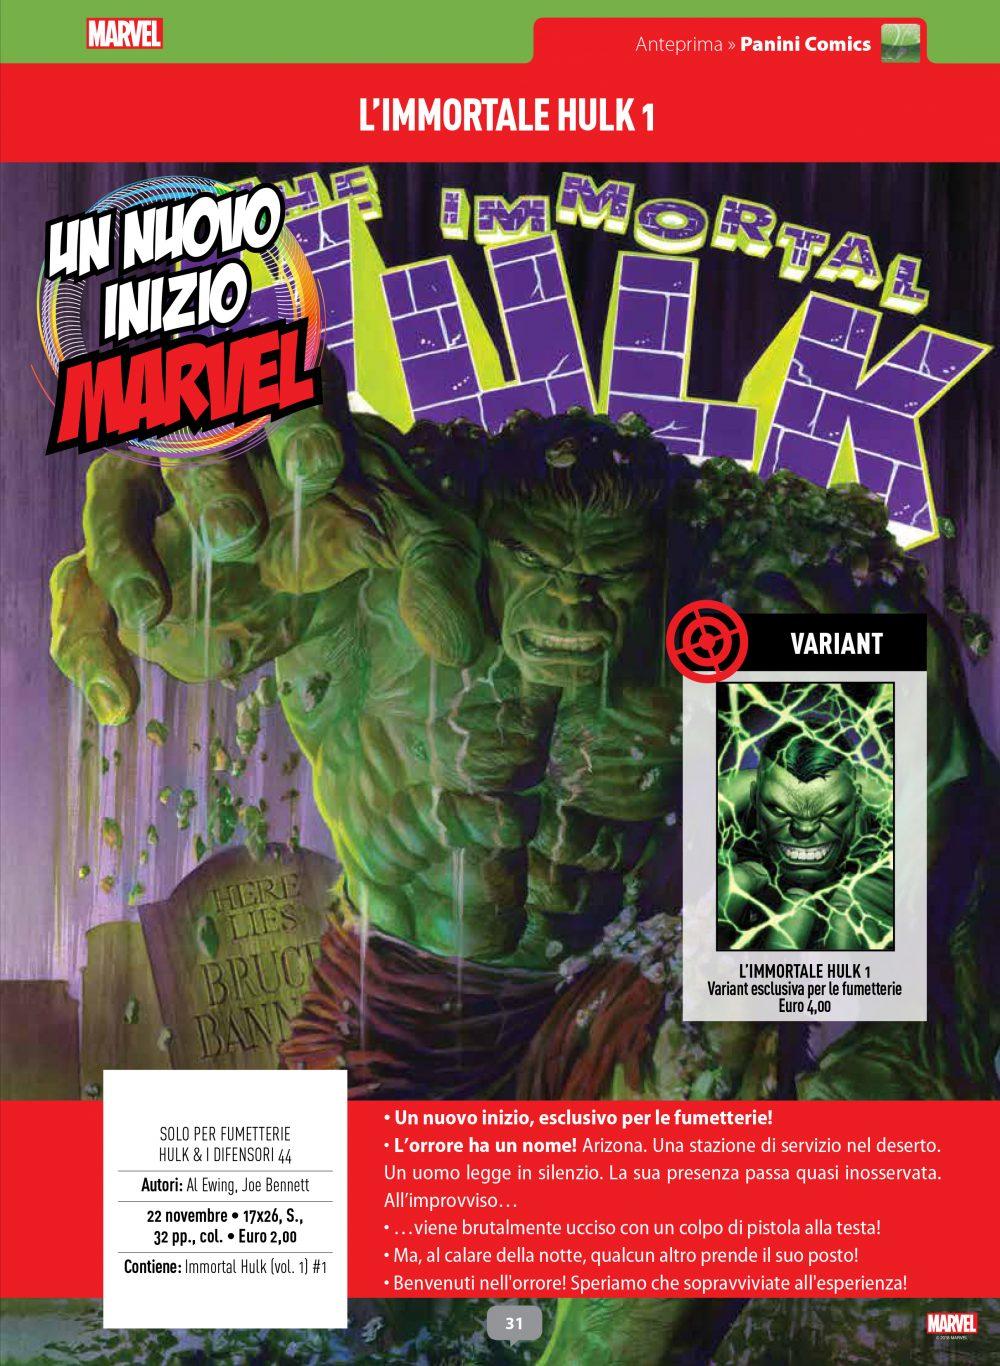 L'Immortale Hulk su Anteprima